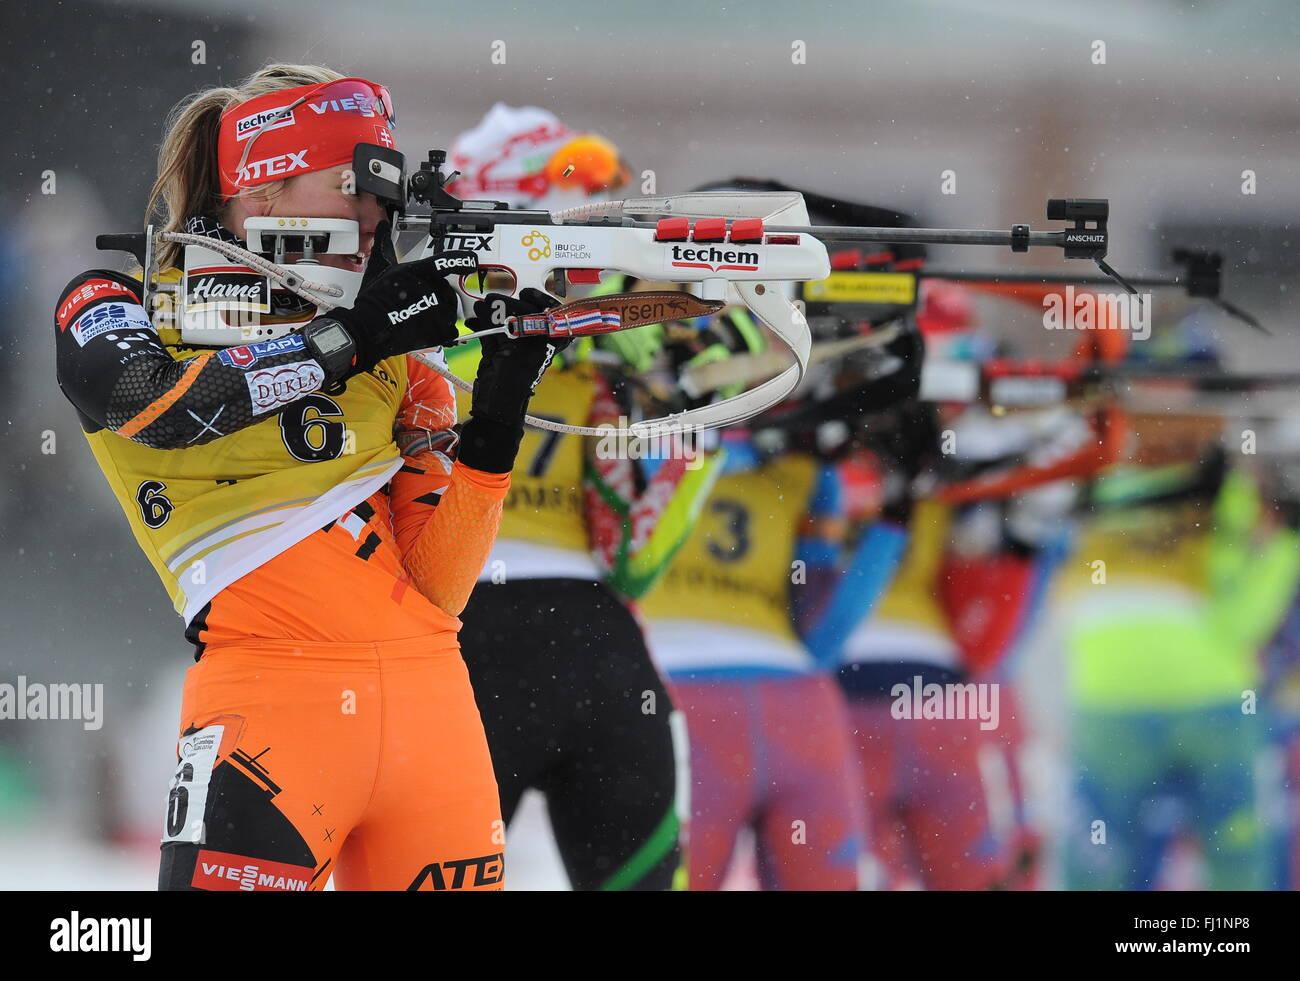 Tiumen, Rusia. 28 Feb, 2016. Paulina Fialkova biathlete eslovaca (L) compite para ganar la plata en la mujer inicio Imagen De Stock